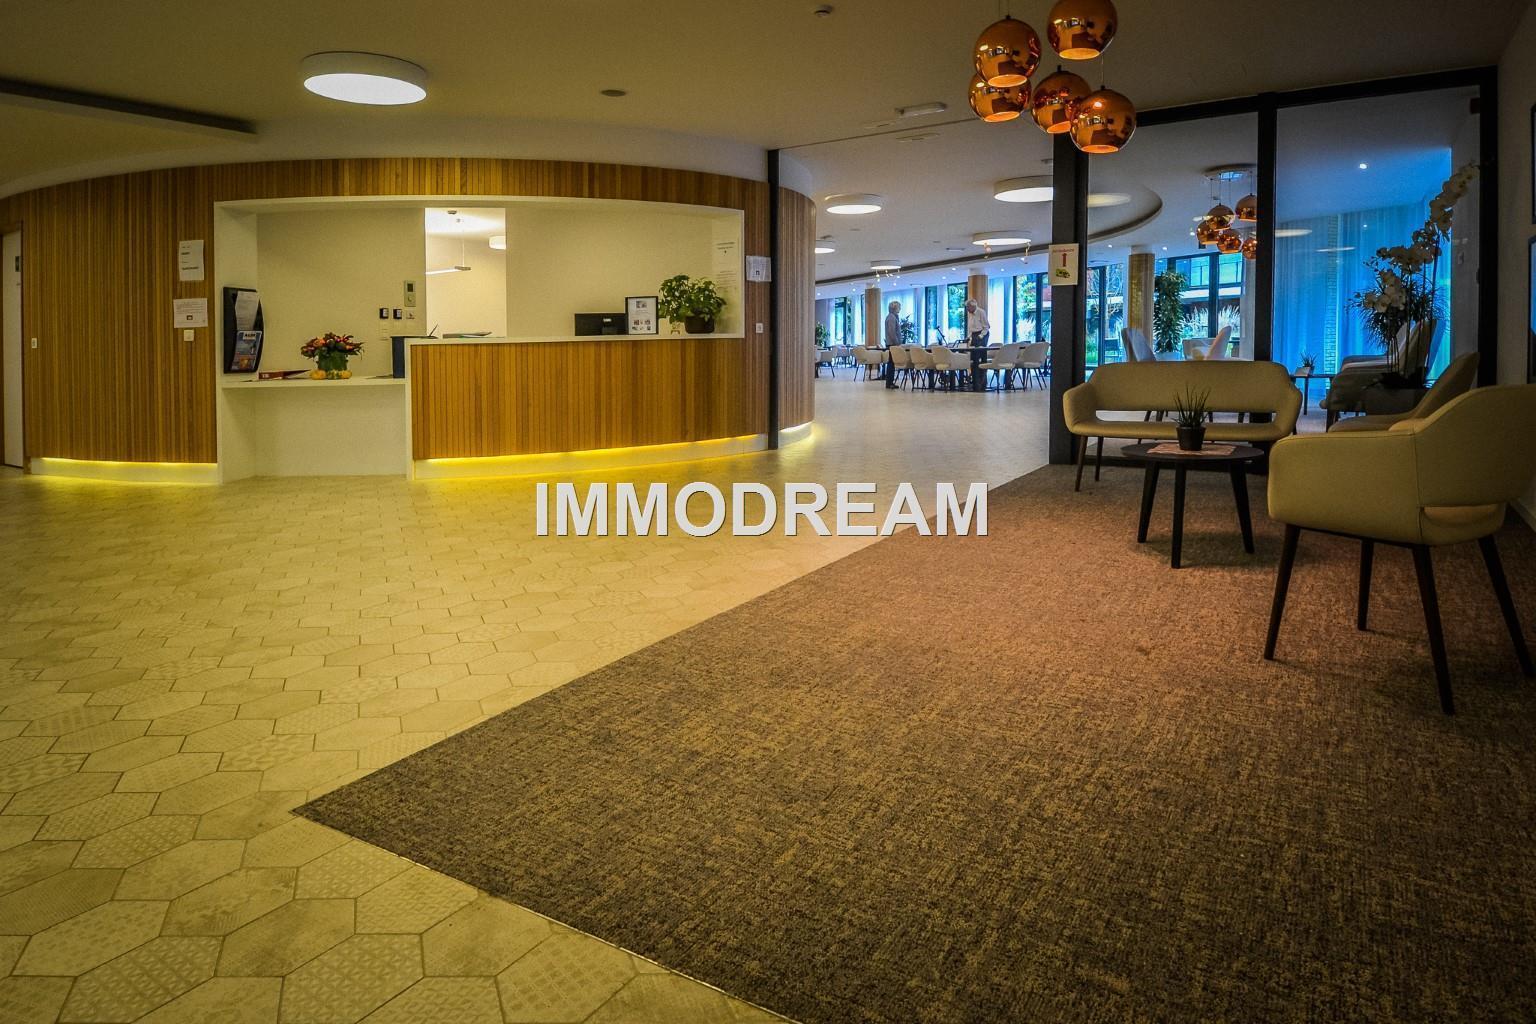 Residences-services - Wezembeek-Oppem - #3909185-13